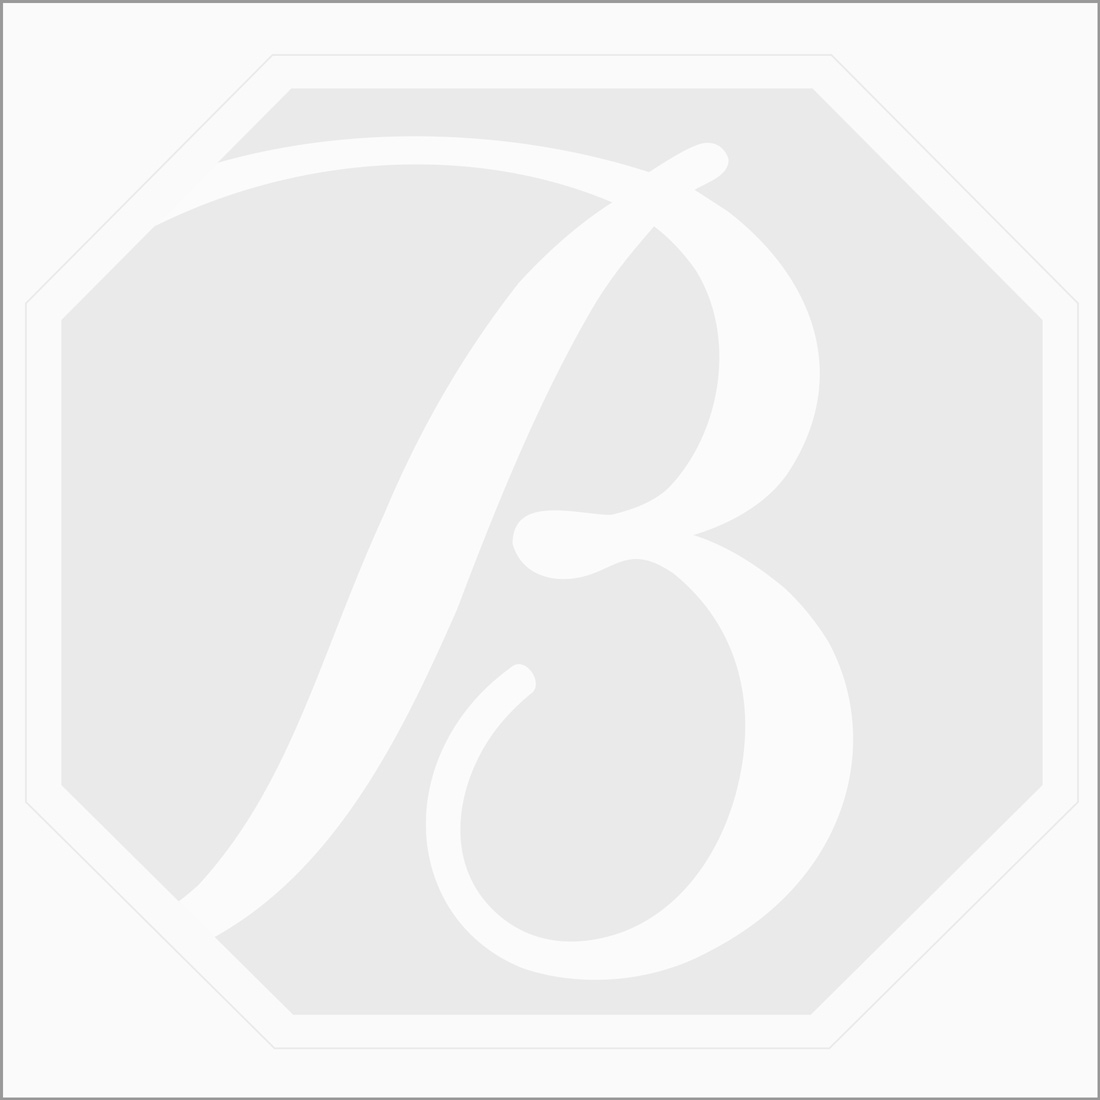 8.50 x 6 mm - Medium Maroon Rose Cut Diamond Cushion Shape - 3.06 carats (FncyDiaRC1054)